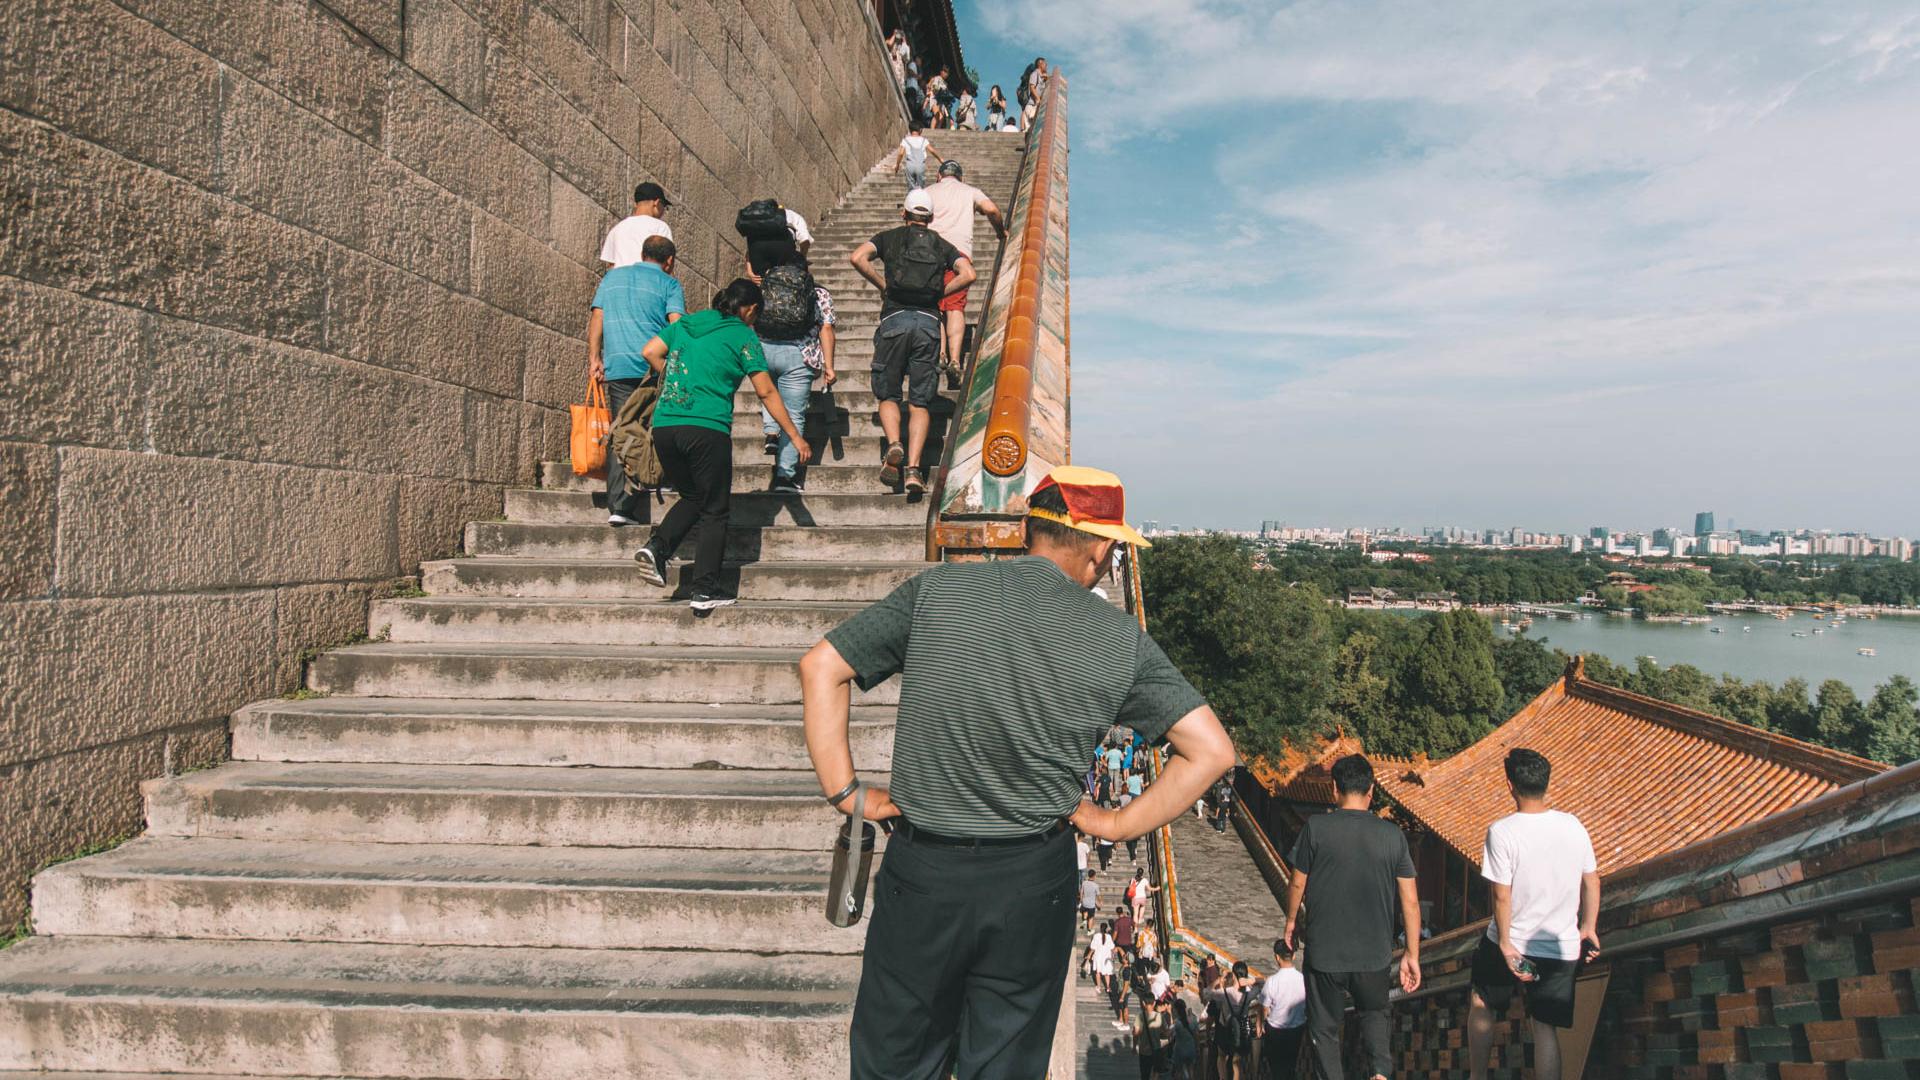 DSC_0207_pechino_summer_palace_travel_psych_chiara_cina